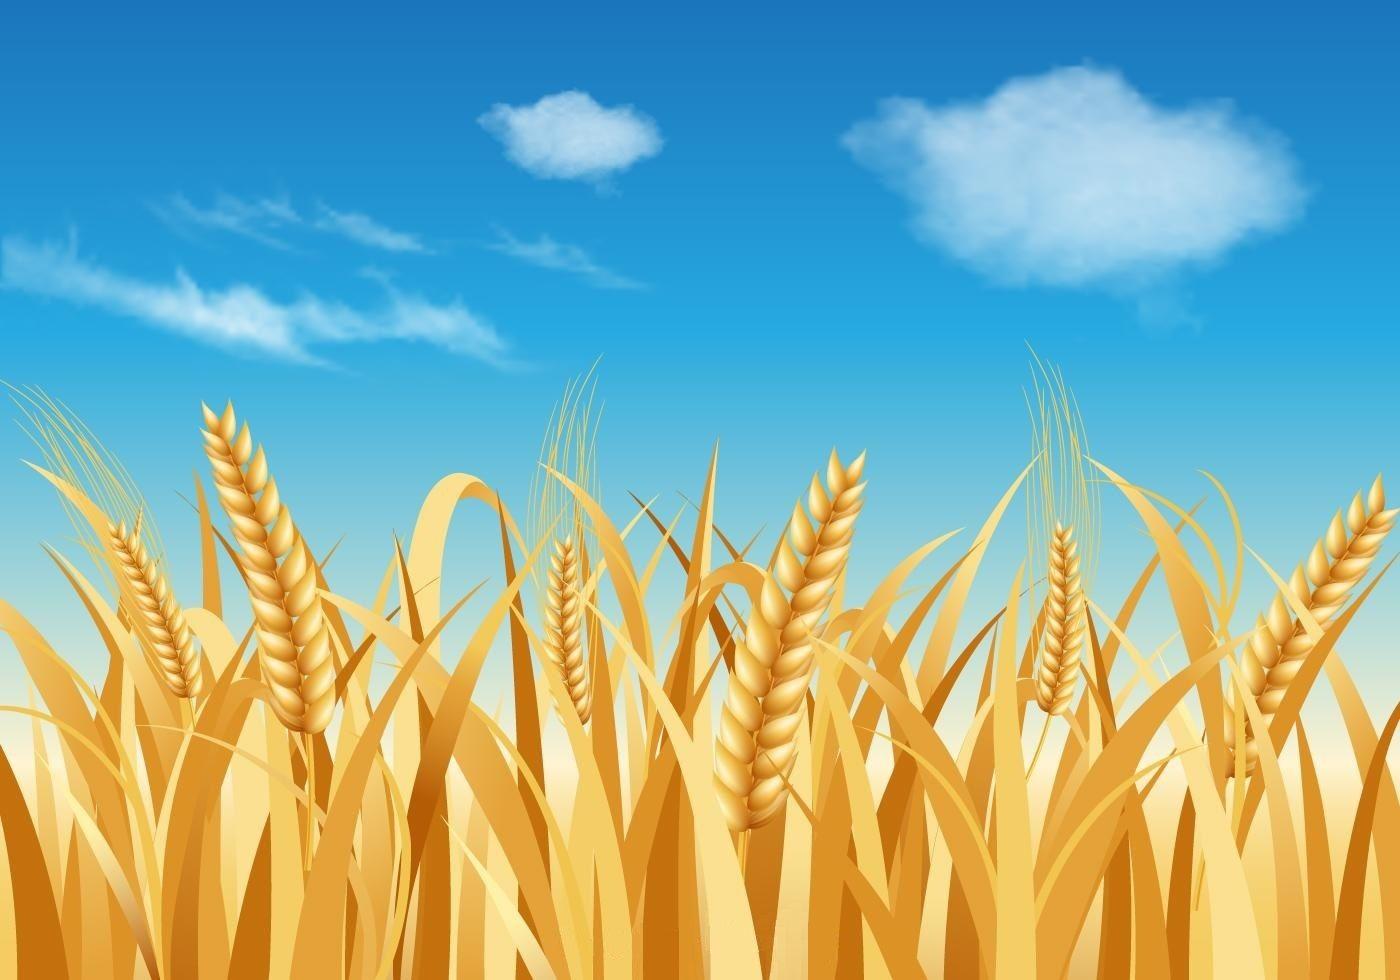 Wheat Stalk Landscape Landscape Background Vector Art